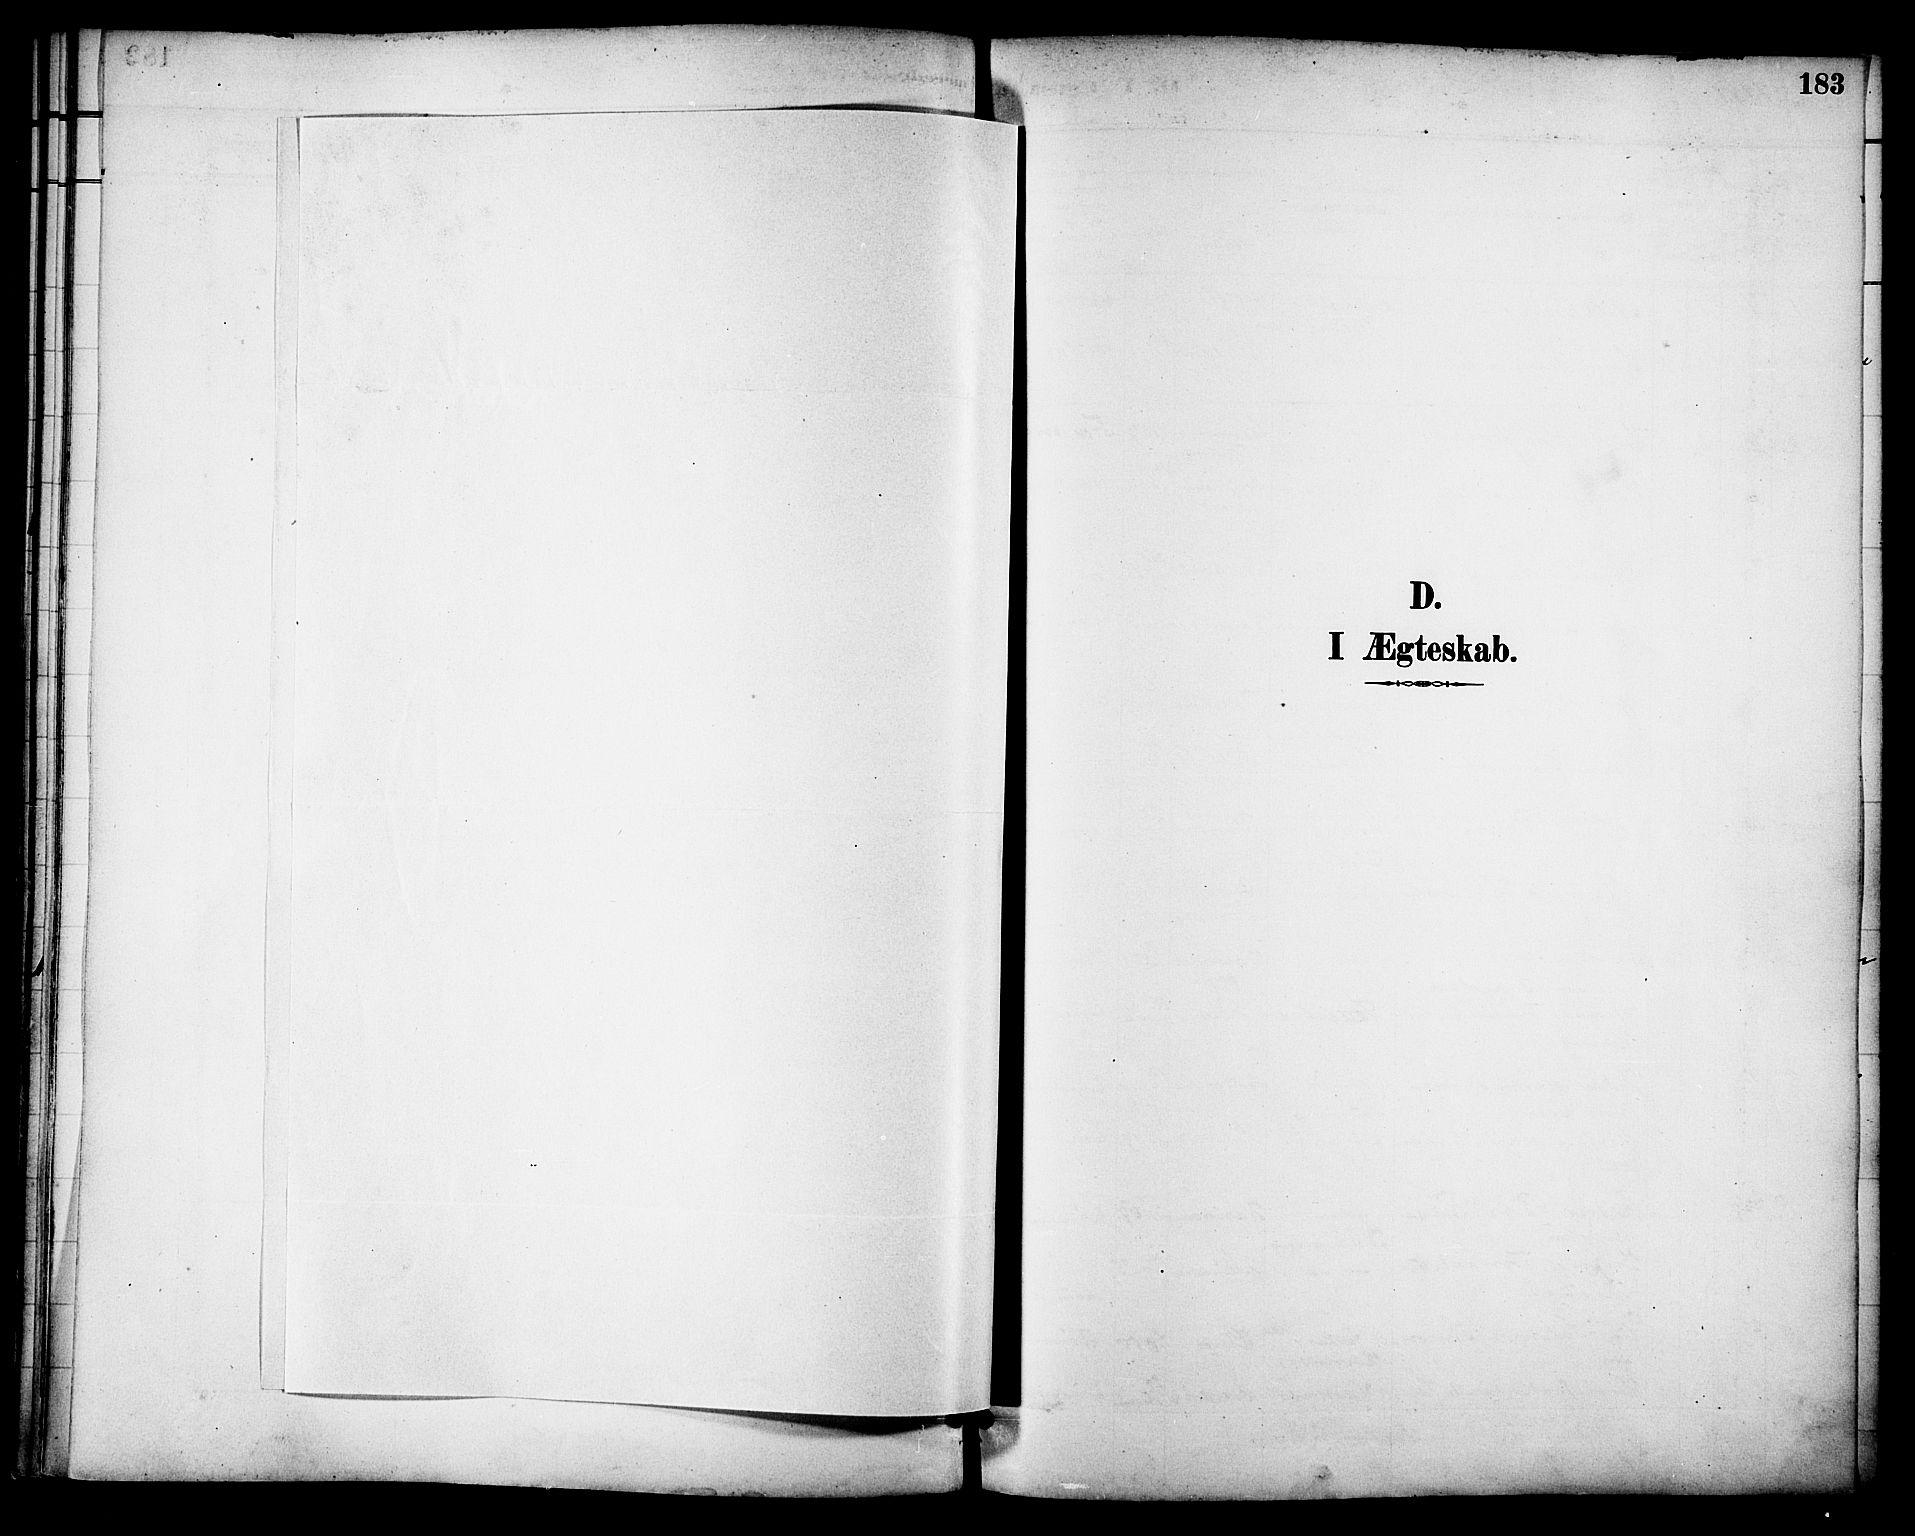 SAT, Ministerialprotokoller, klokkerbøker og fødselsregistre - Nordland, 863/L0898: Ministerialbok nr. 863A10, 1886-1897, s. 183